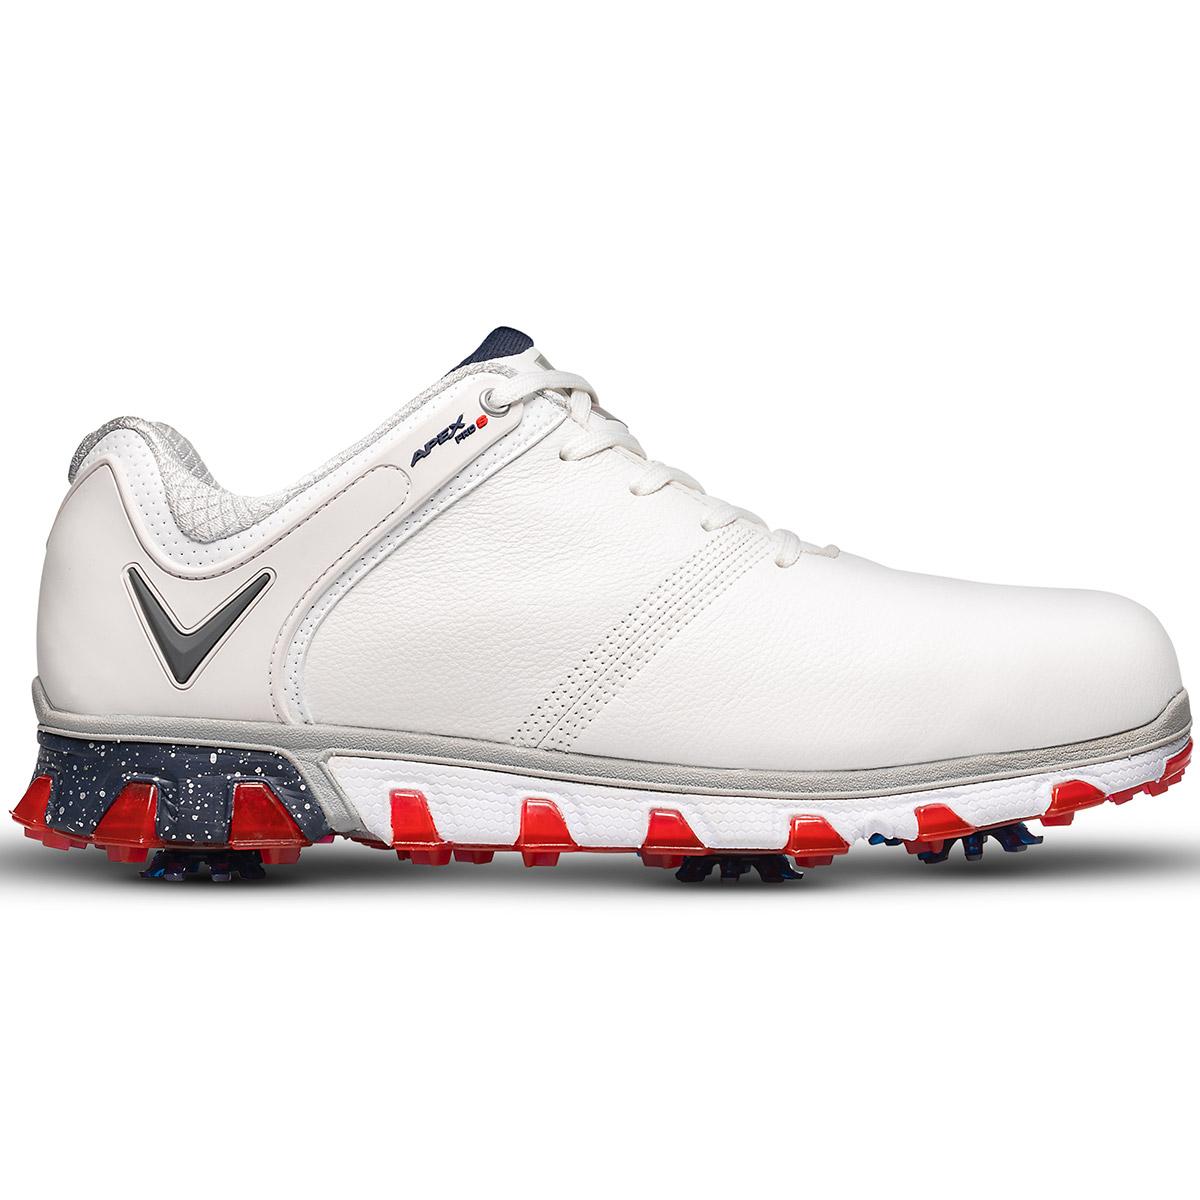 Callaway Golf Apex Pro S Shoes | Online